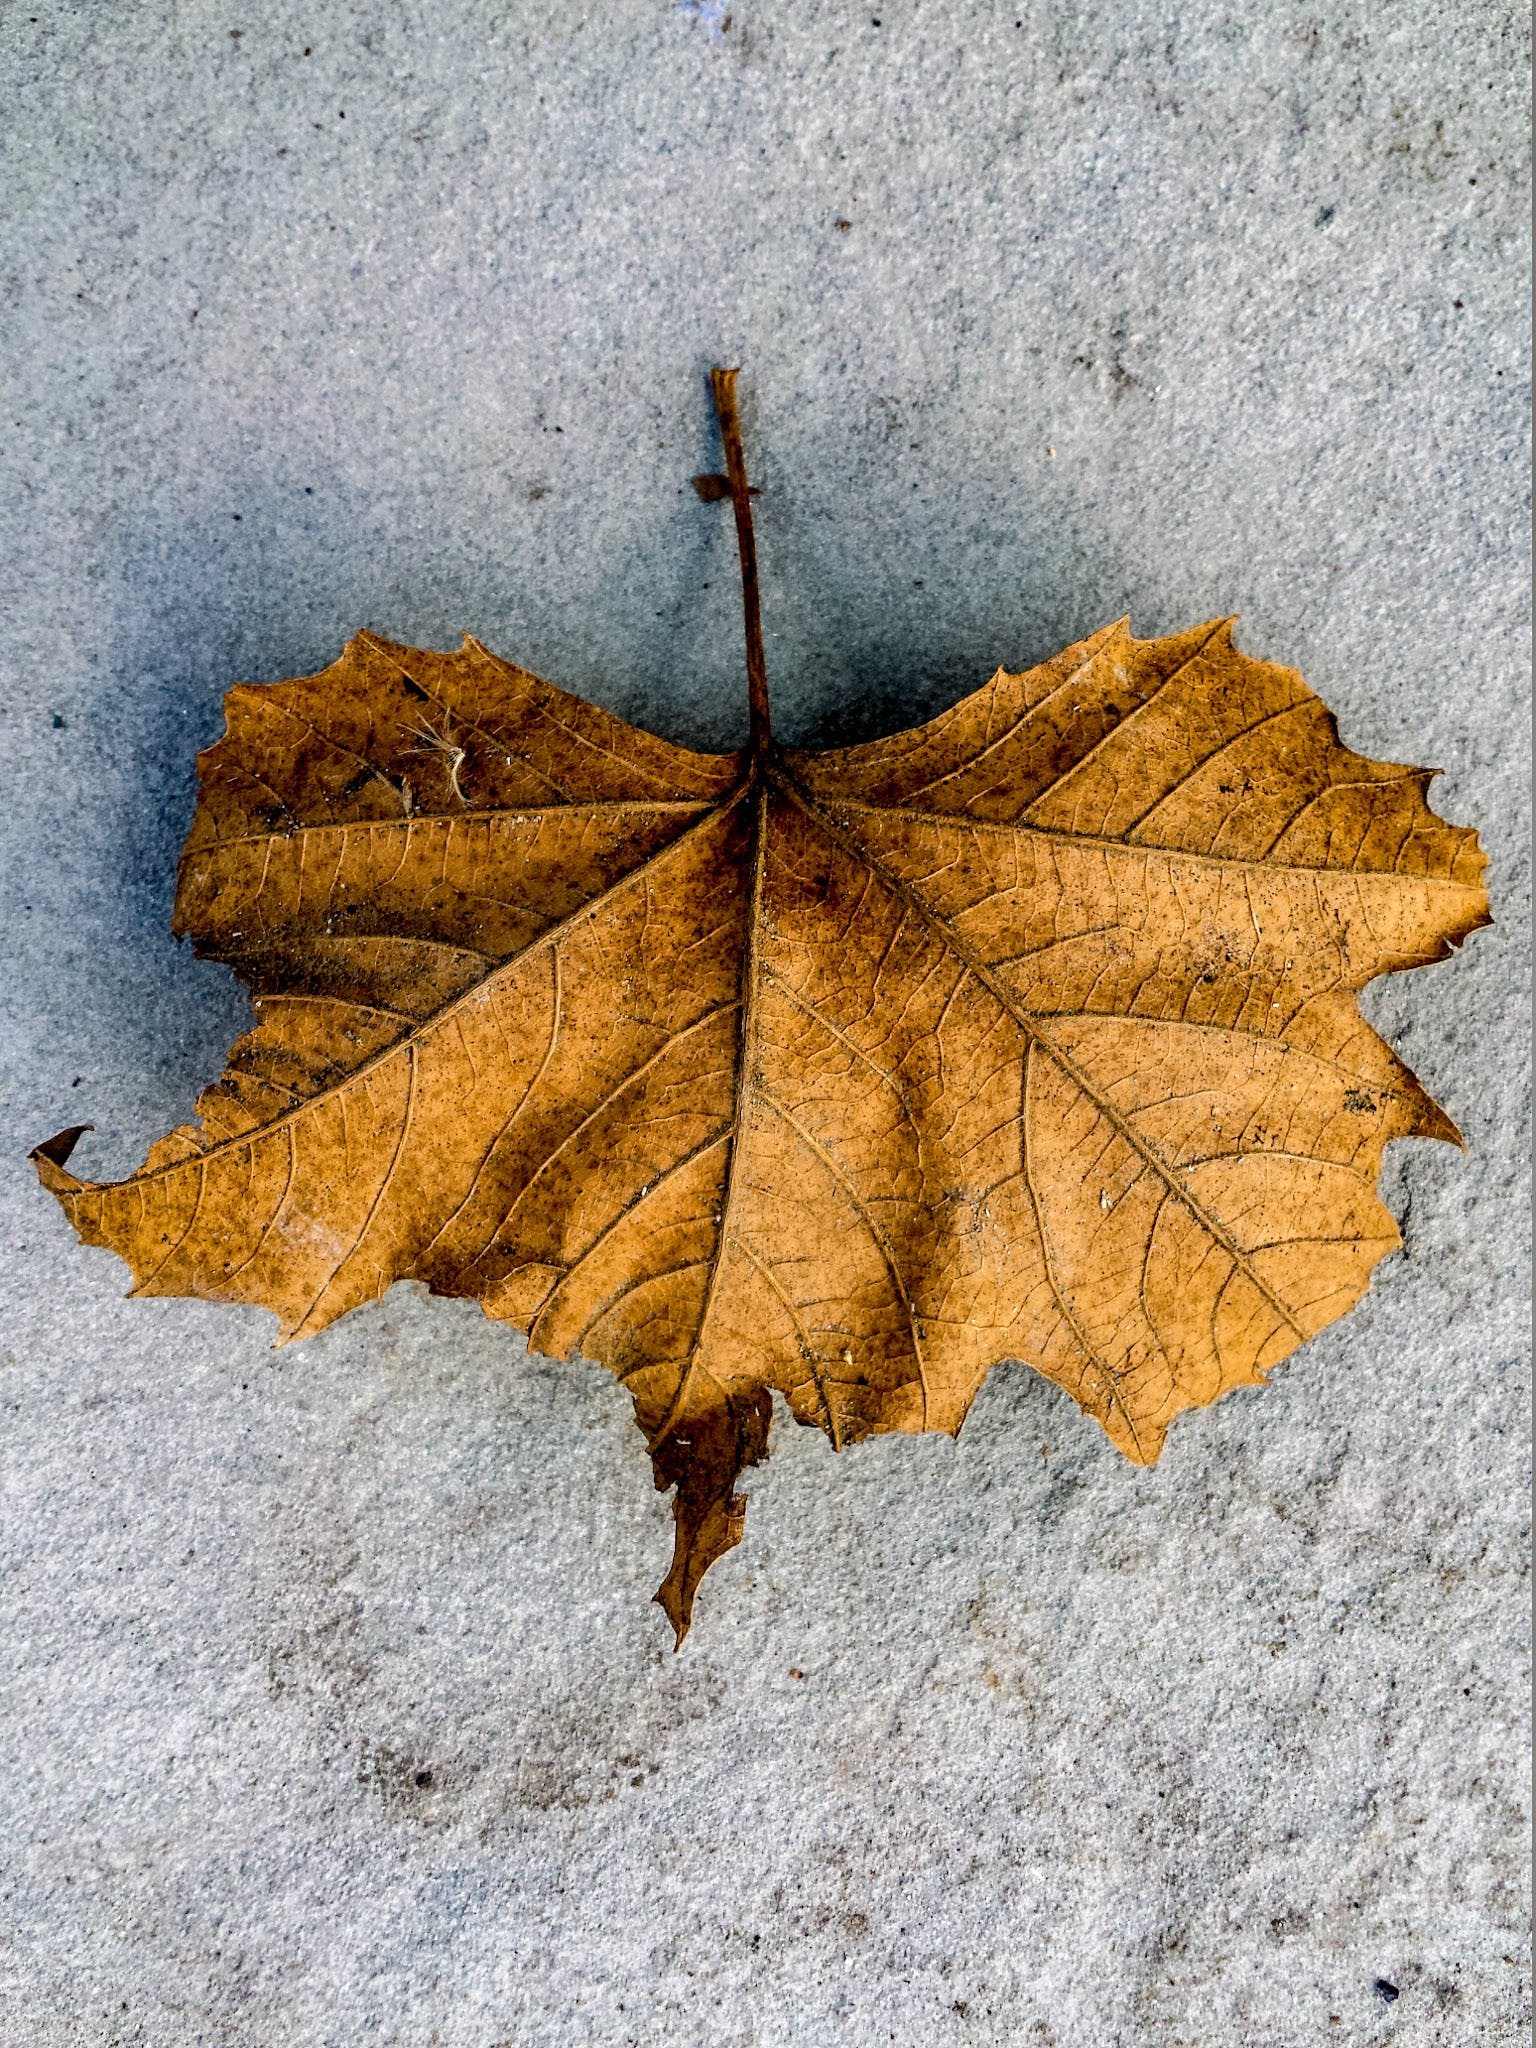 Free stock photo of dried leaf, leaf